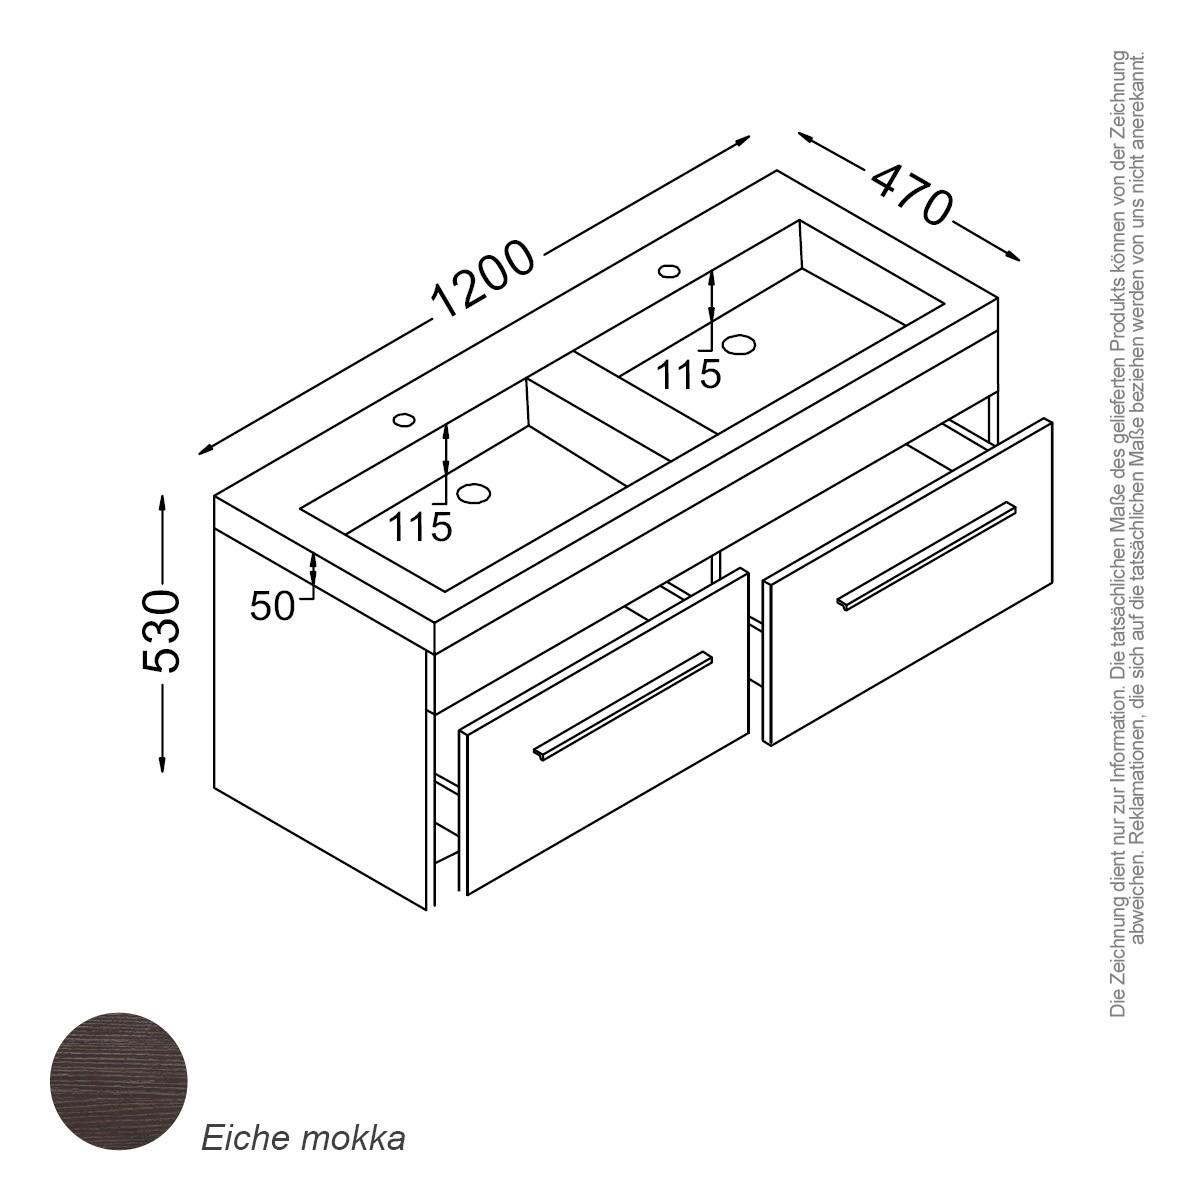 paket] madrid waschtisch-set 120 cm mokka | bad-trends, badmöbel